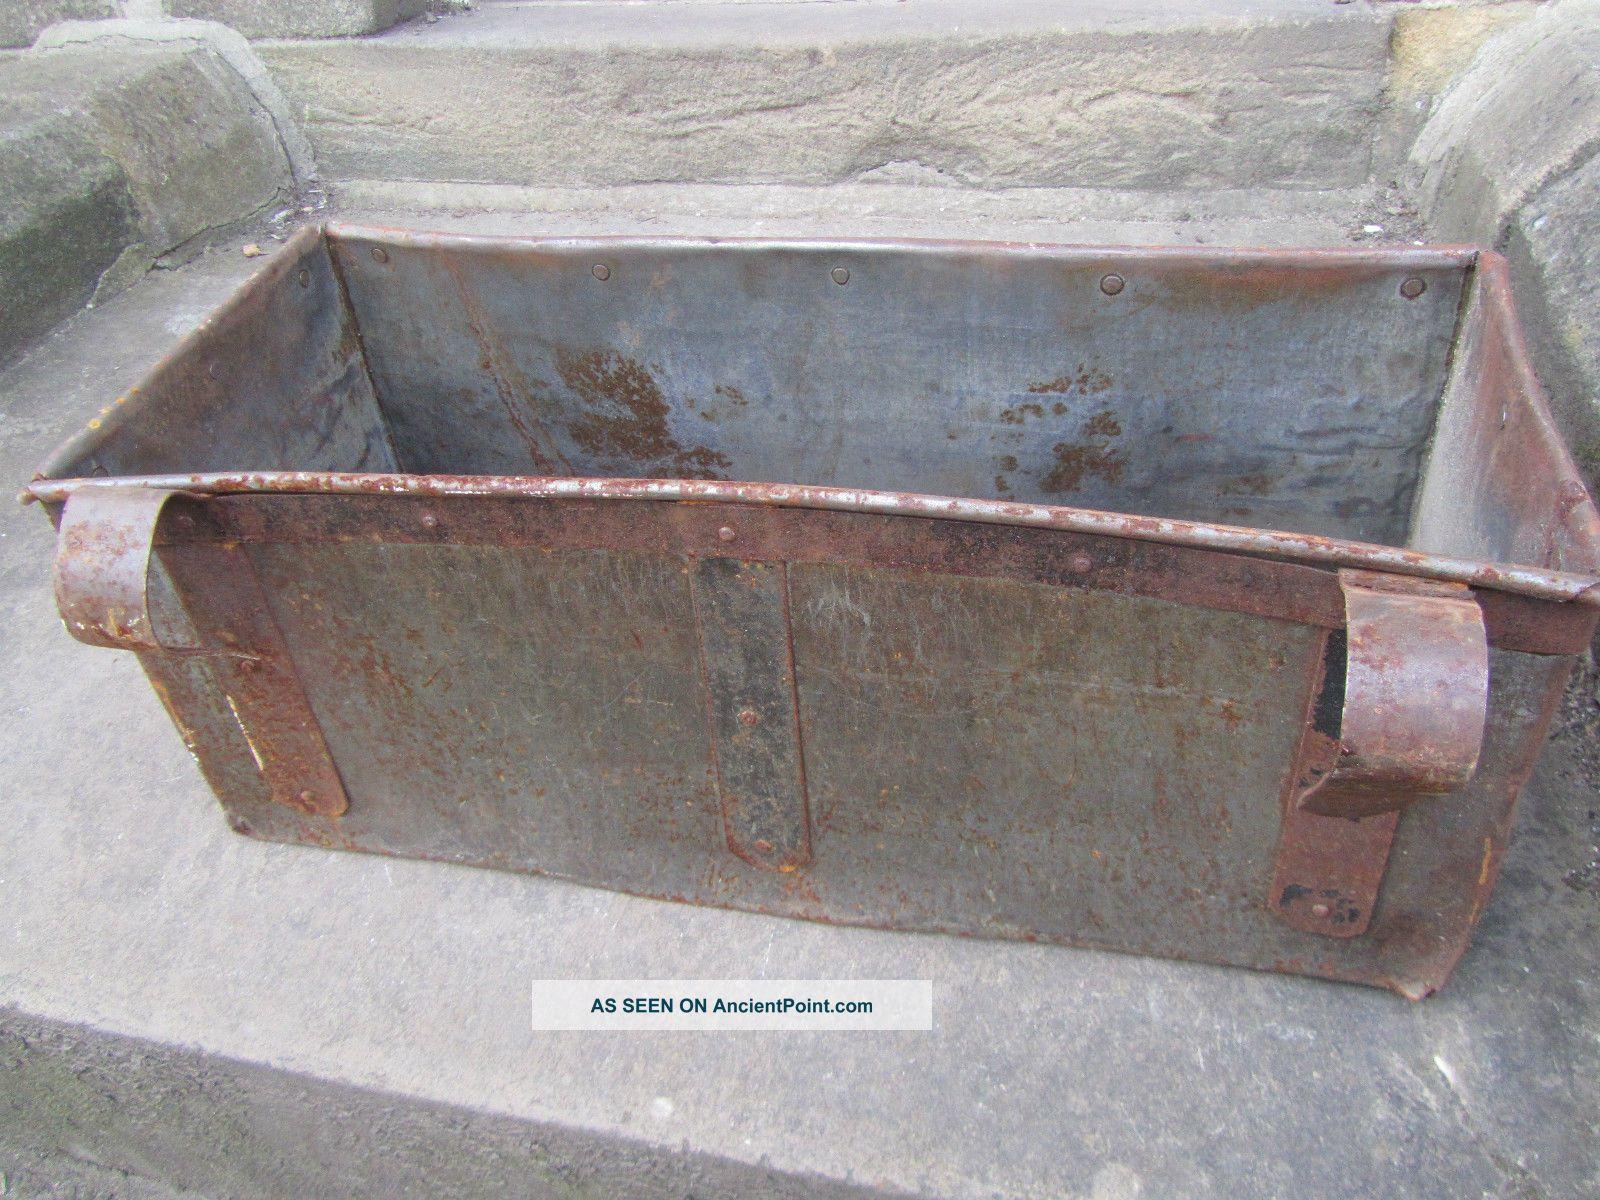 Large Antique Metal Trough Tub Planter Box Brass Plaque Industrial ...